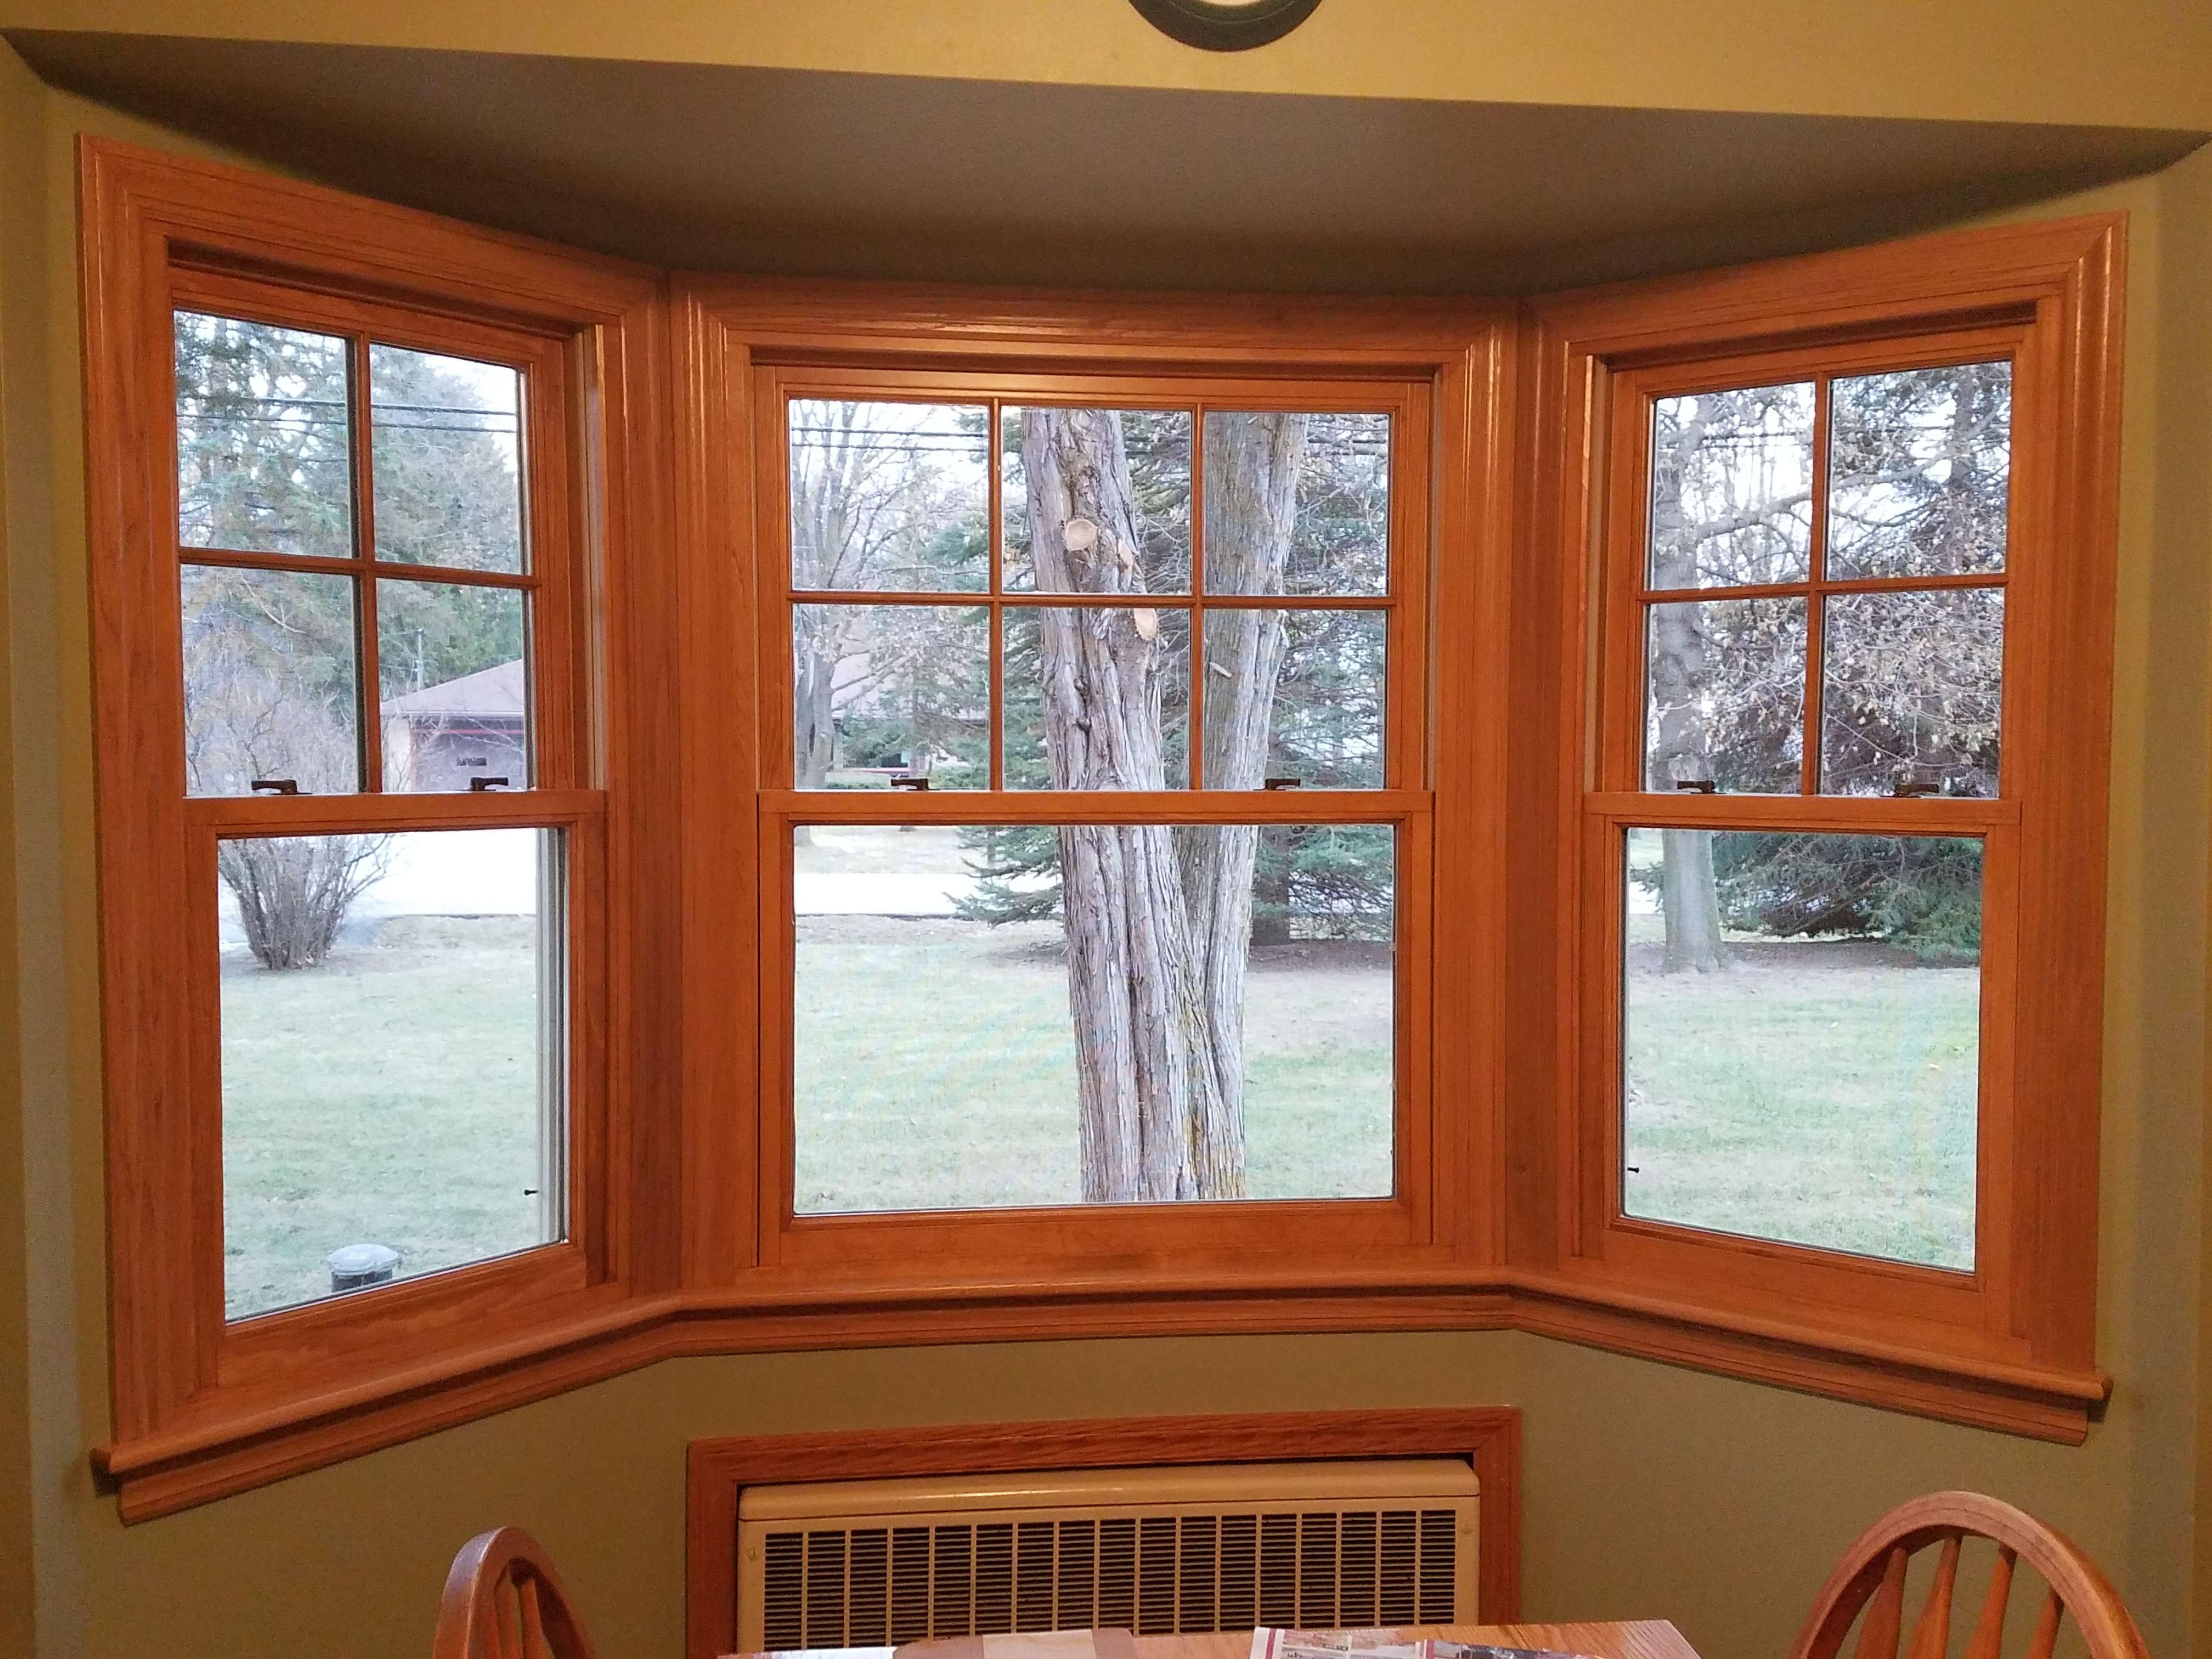 Free Replacement Window Estimate Windows Residential Windows